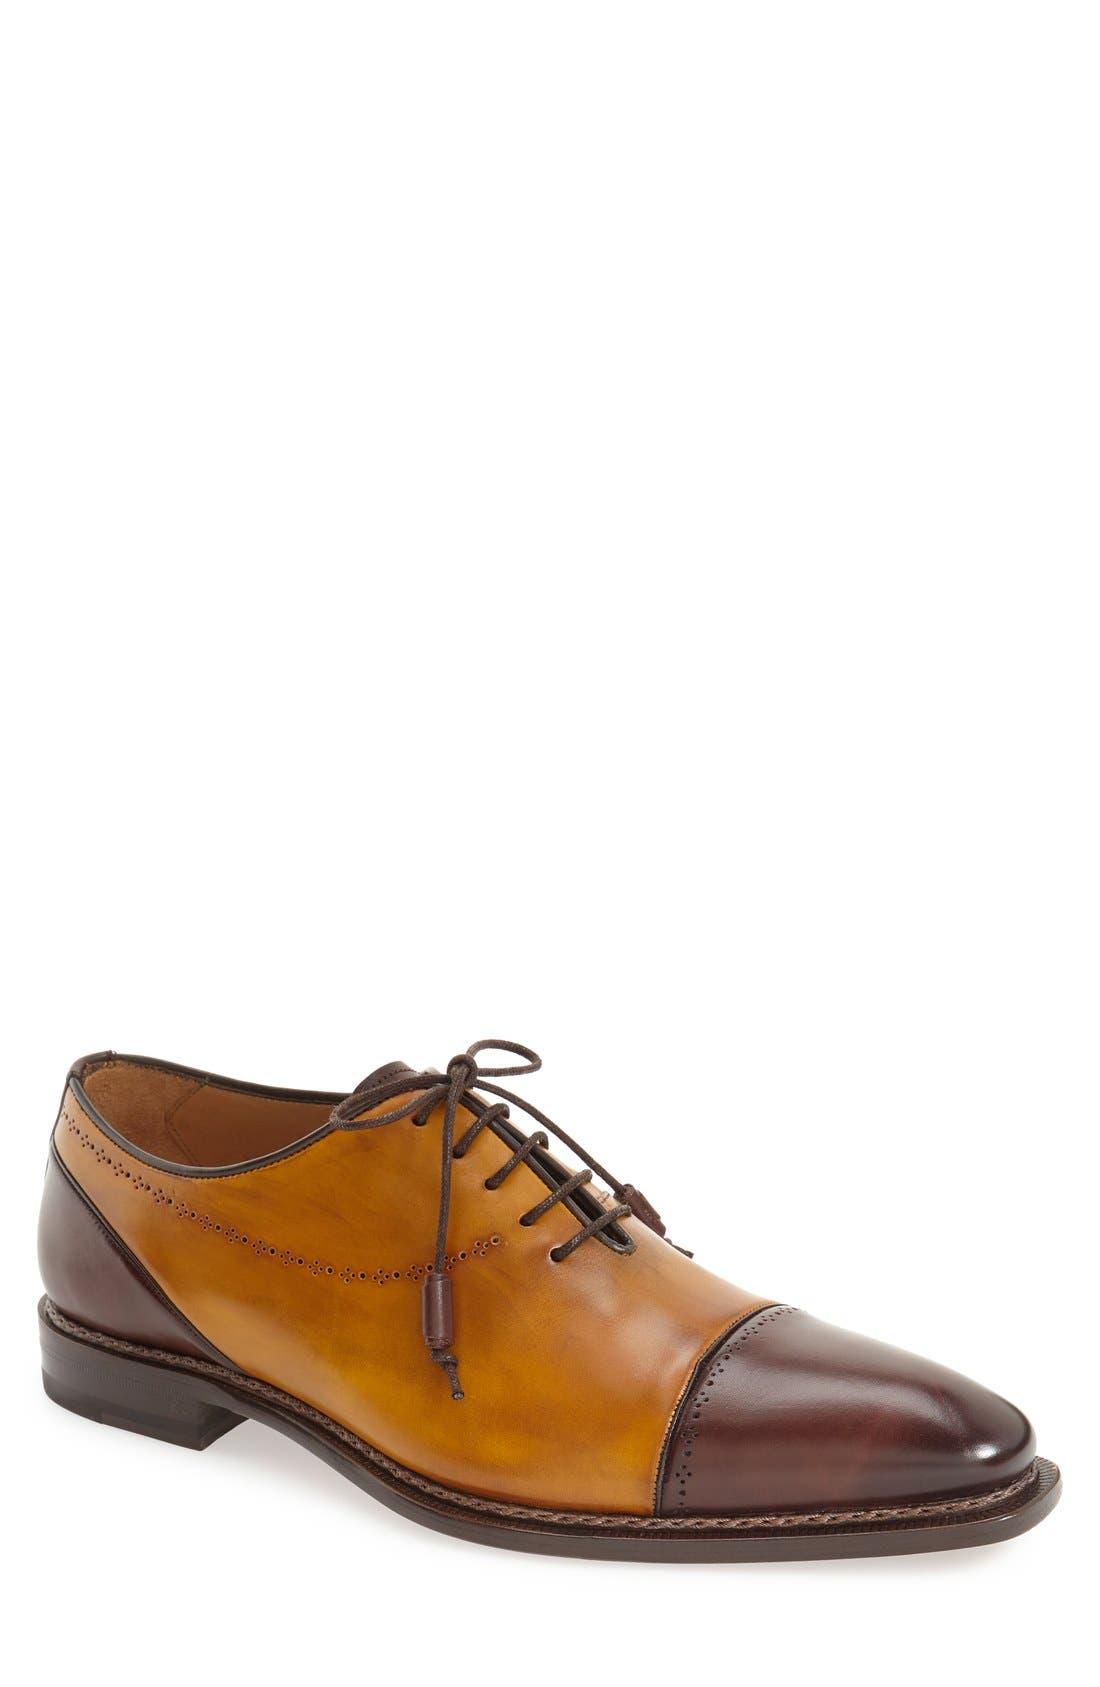 Main Image - Mezlan 'Antico' Cap Toe Oxford (Men)